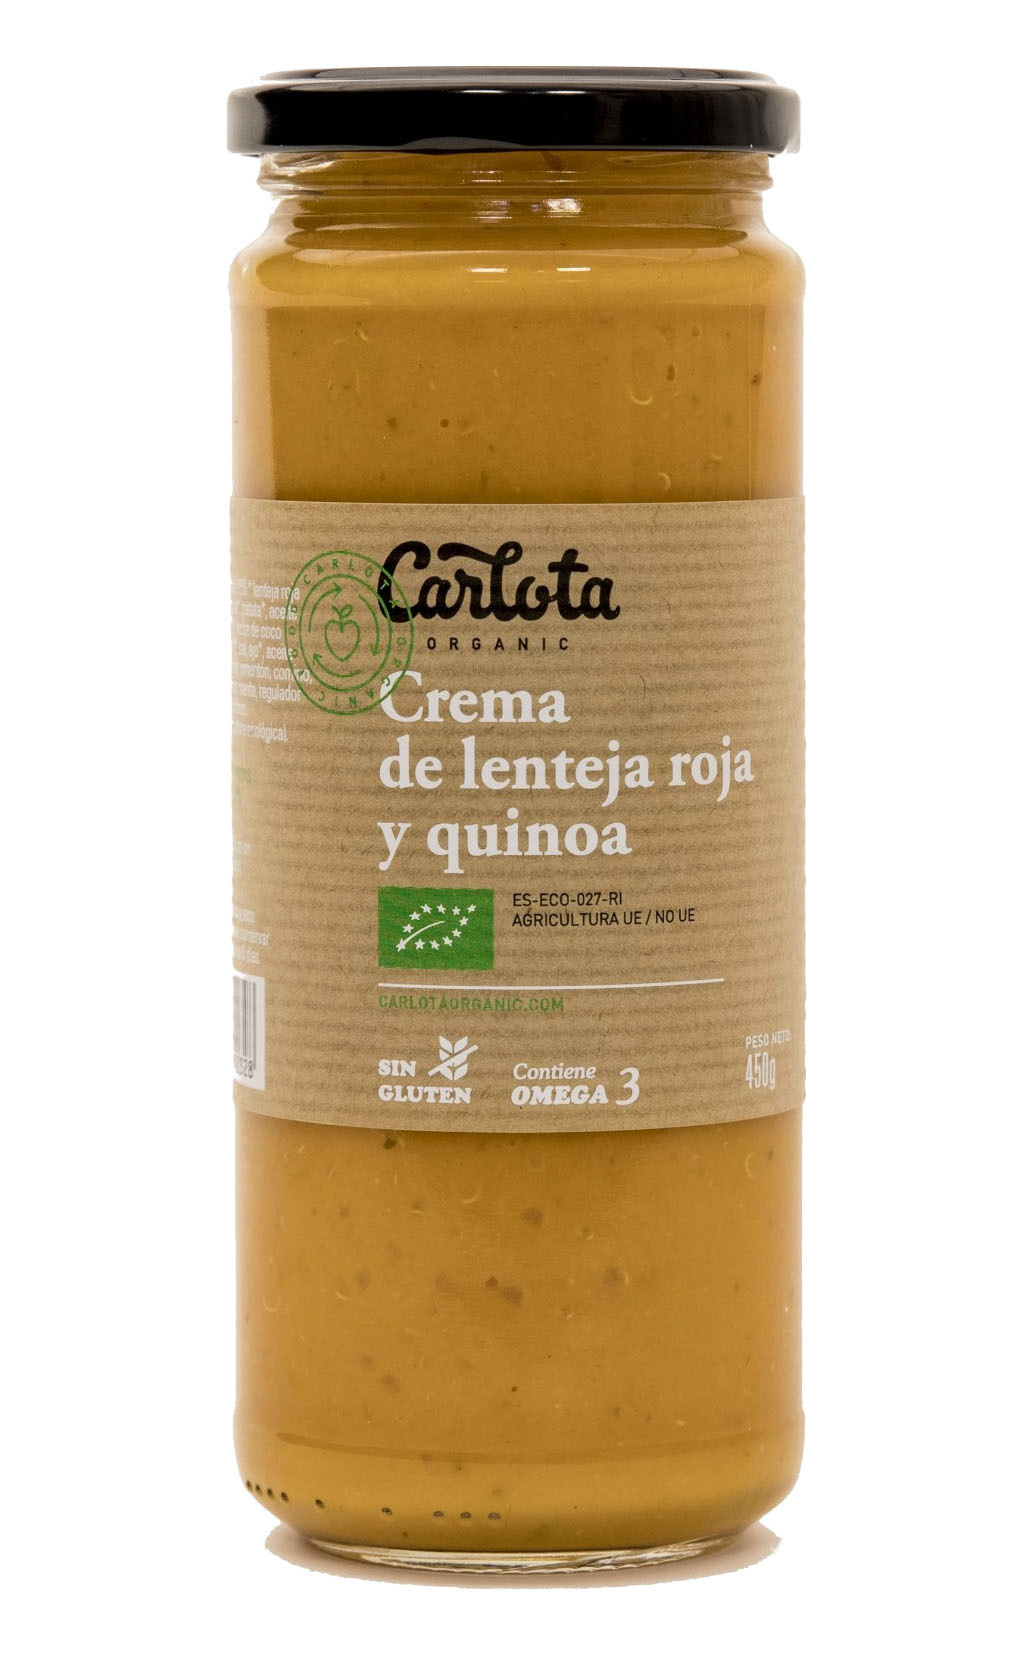 CREMA DE LENTEJA ROJA Y QUINOA 450g